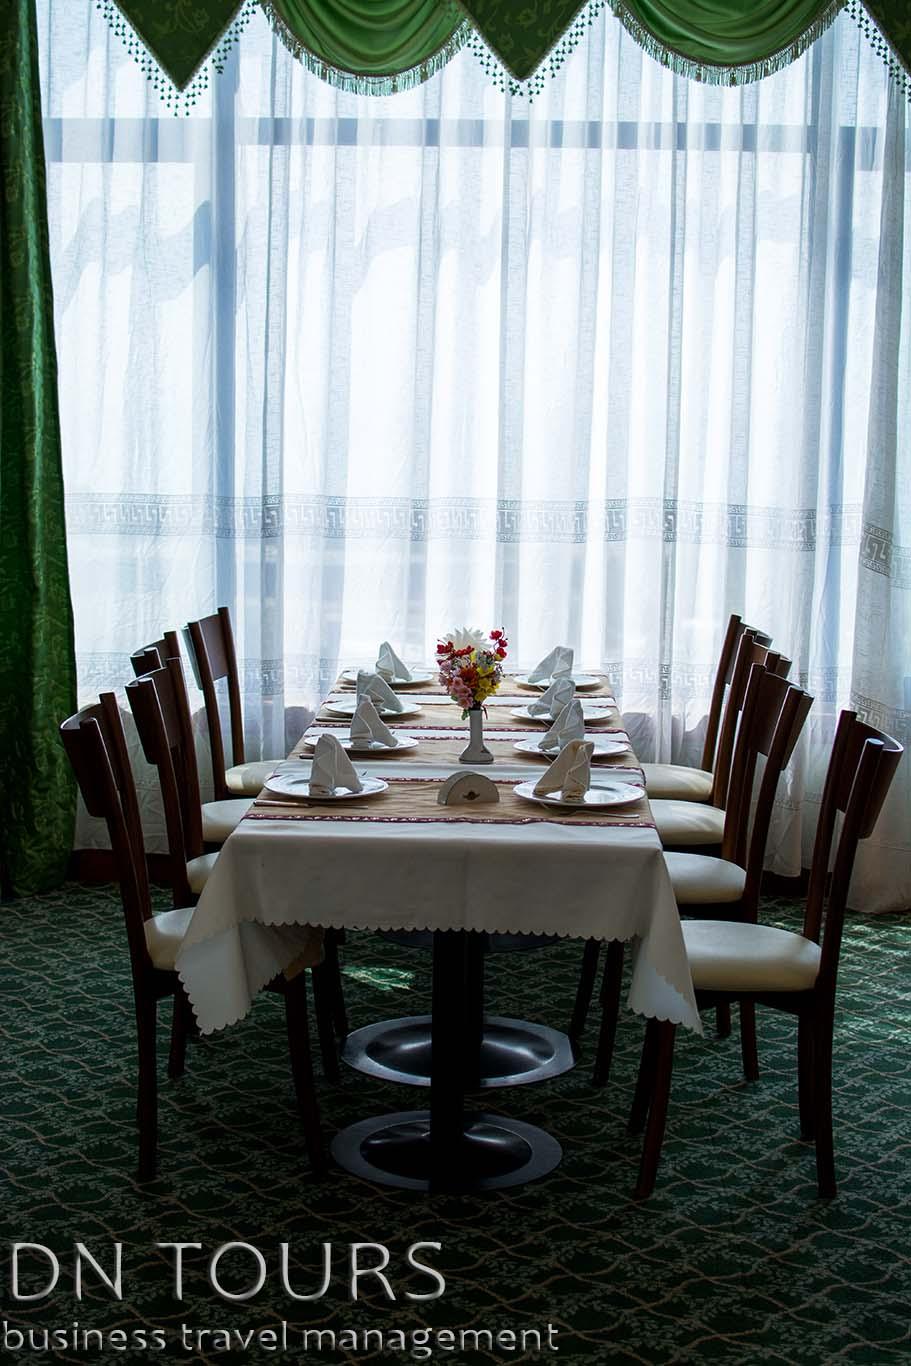 Turkmenbashi Hotel, restaurant, Turkmenbashi city, Turkmenistan (6)